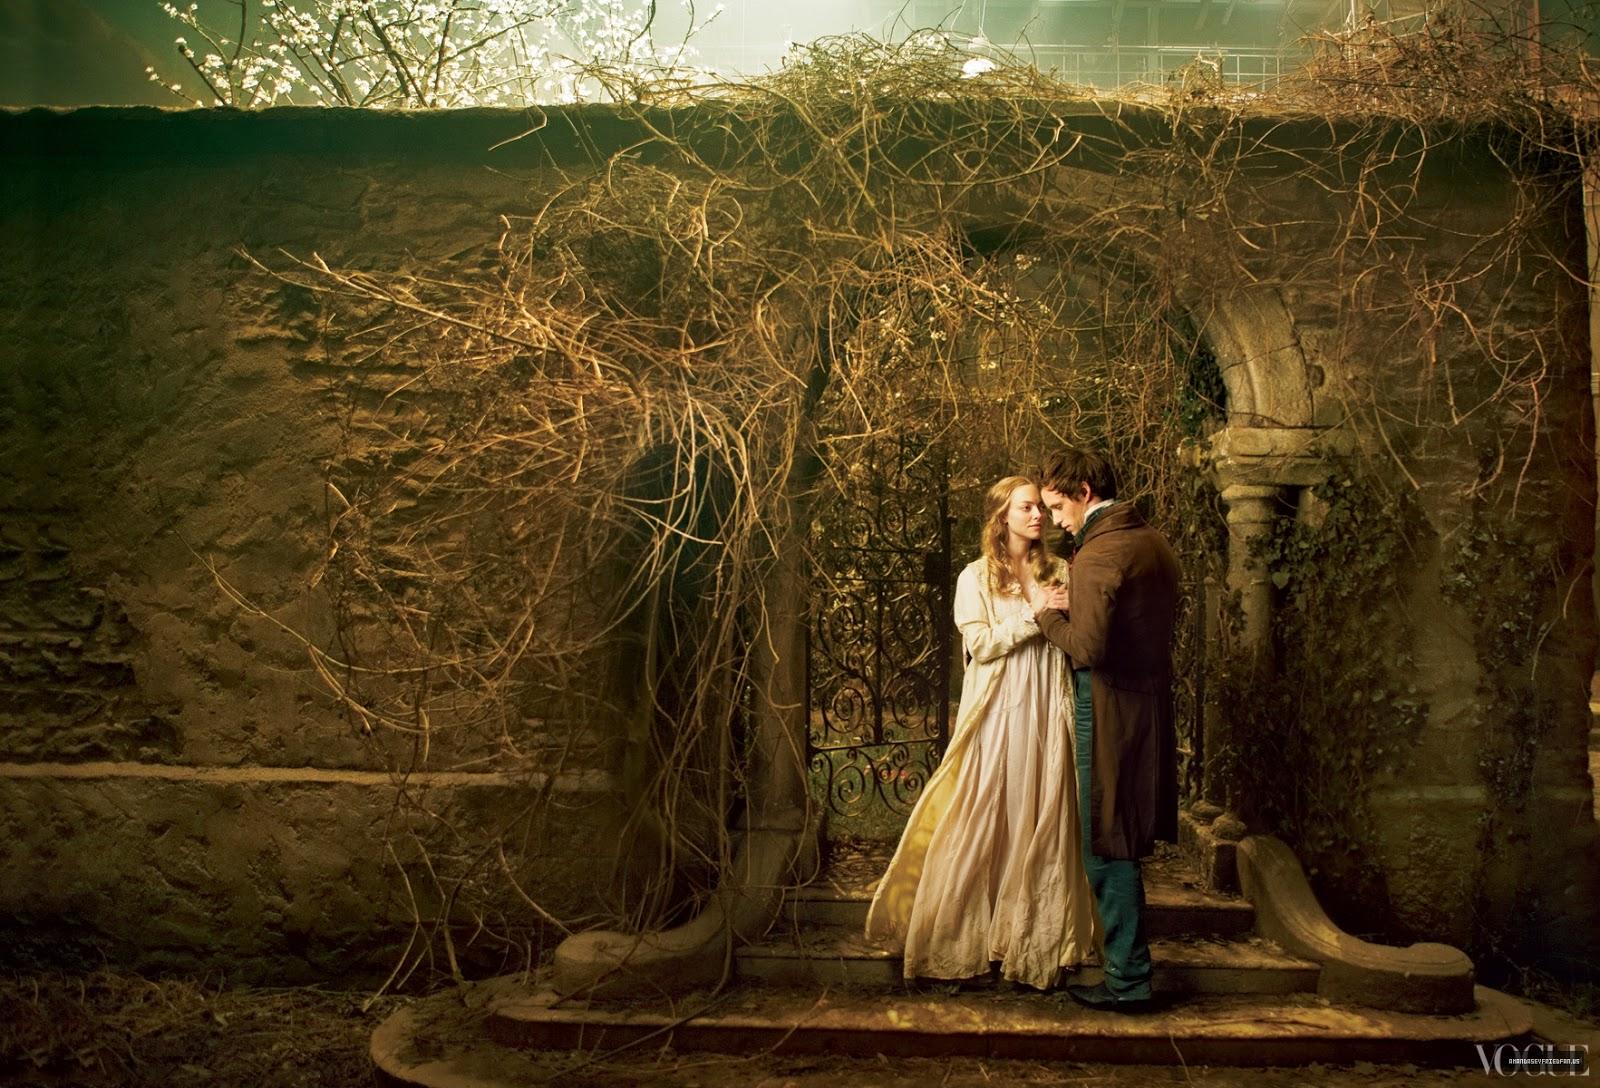 Les Miserables 2012 Finding Wonderland